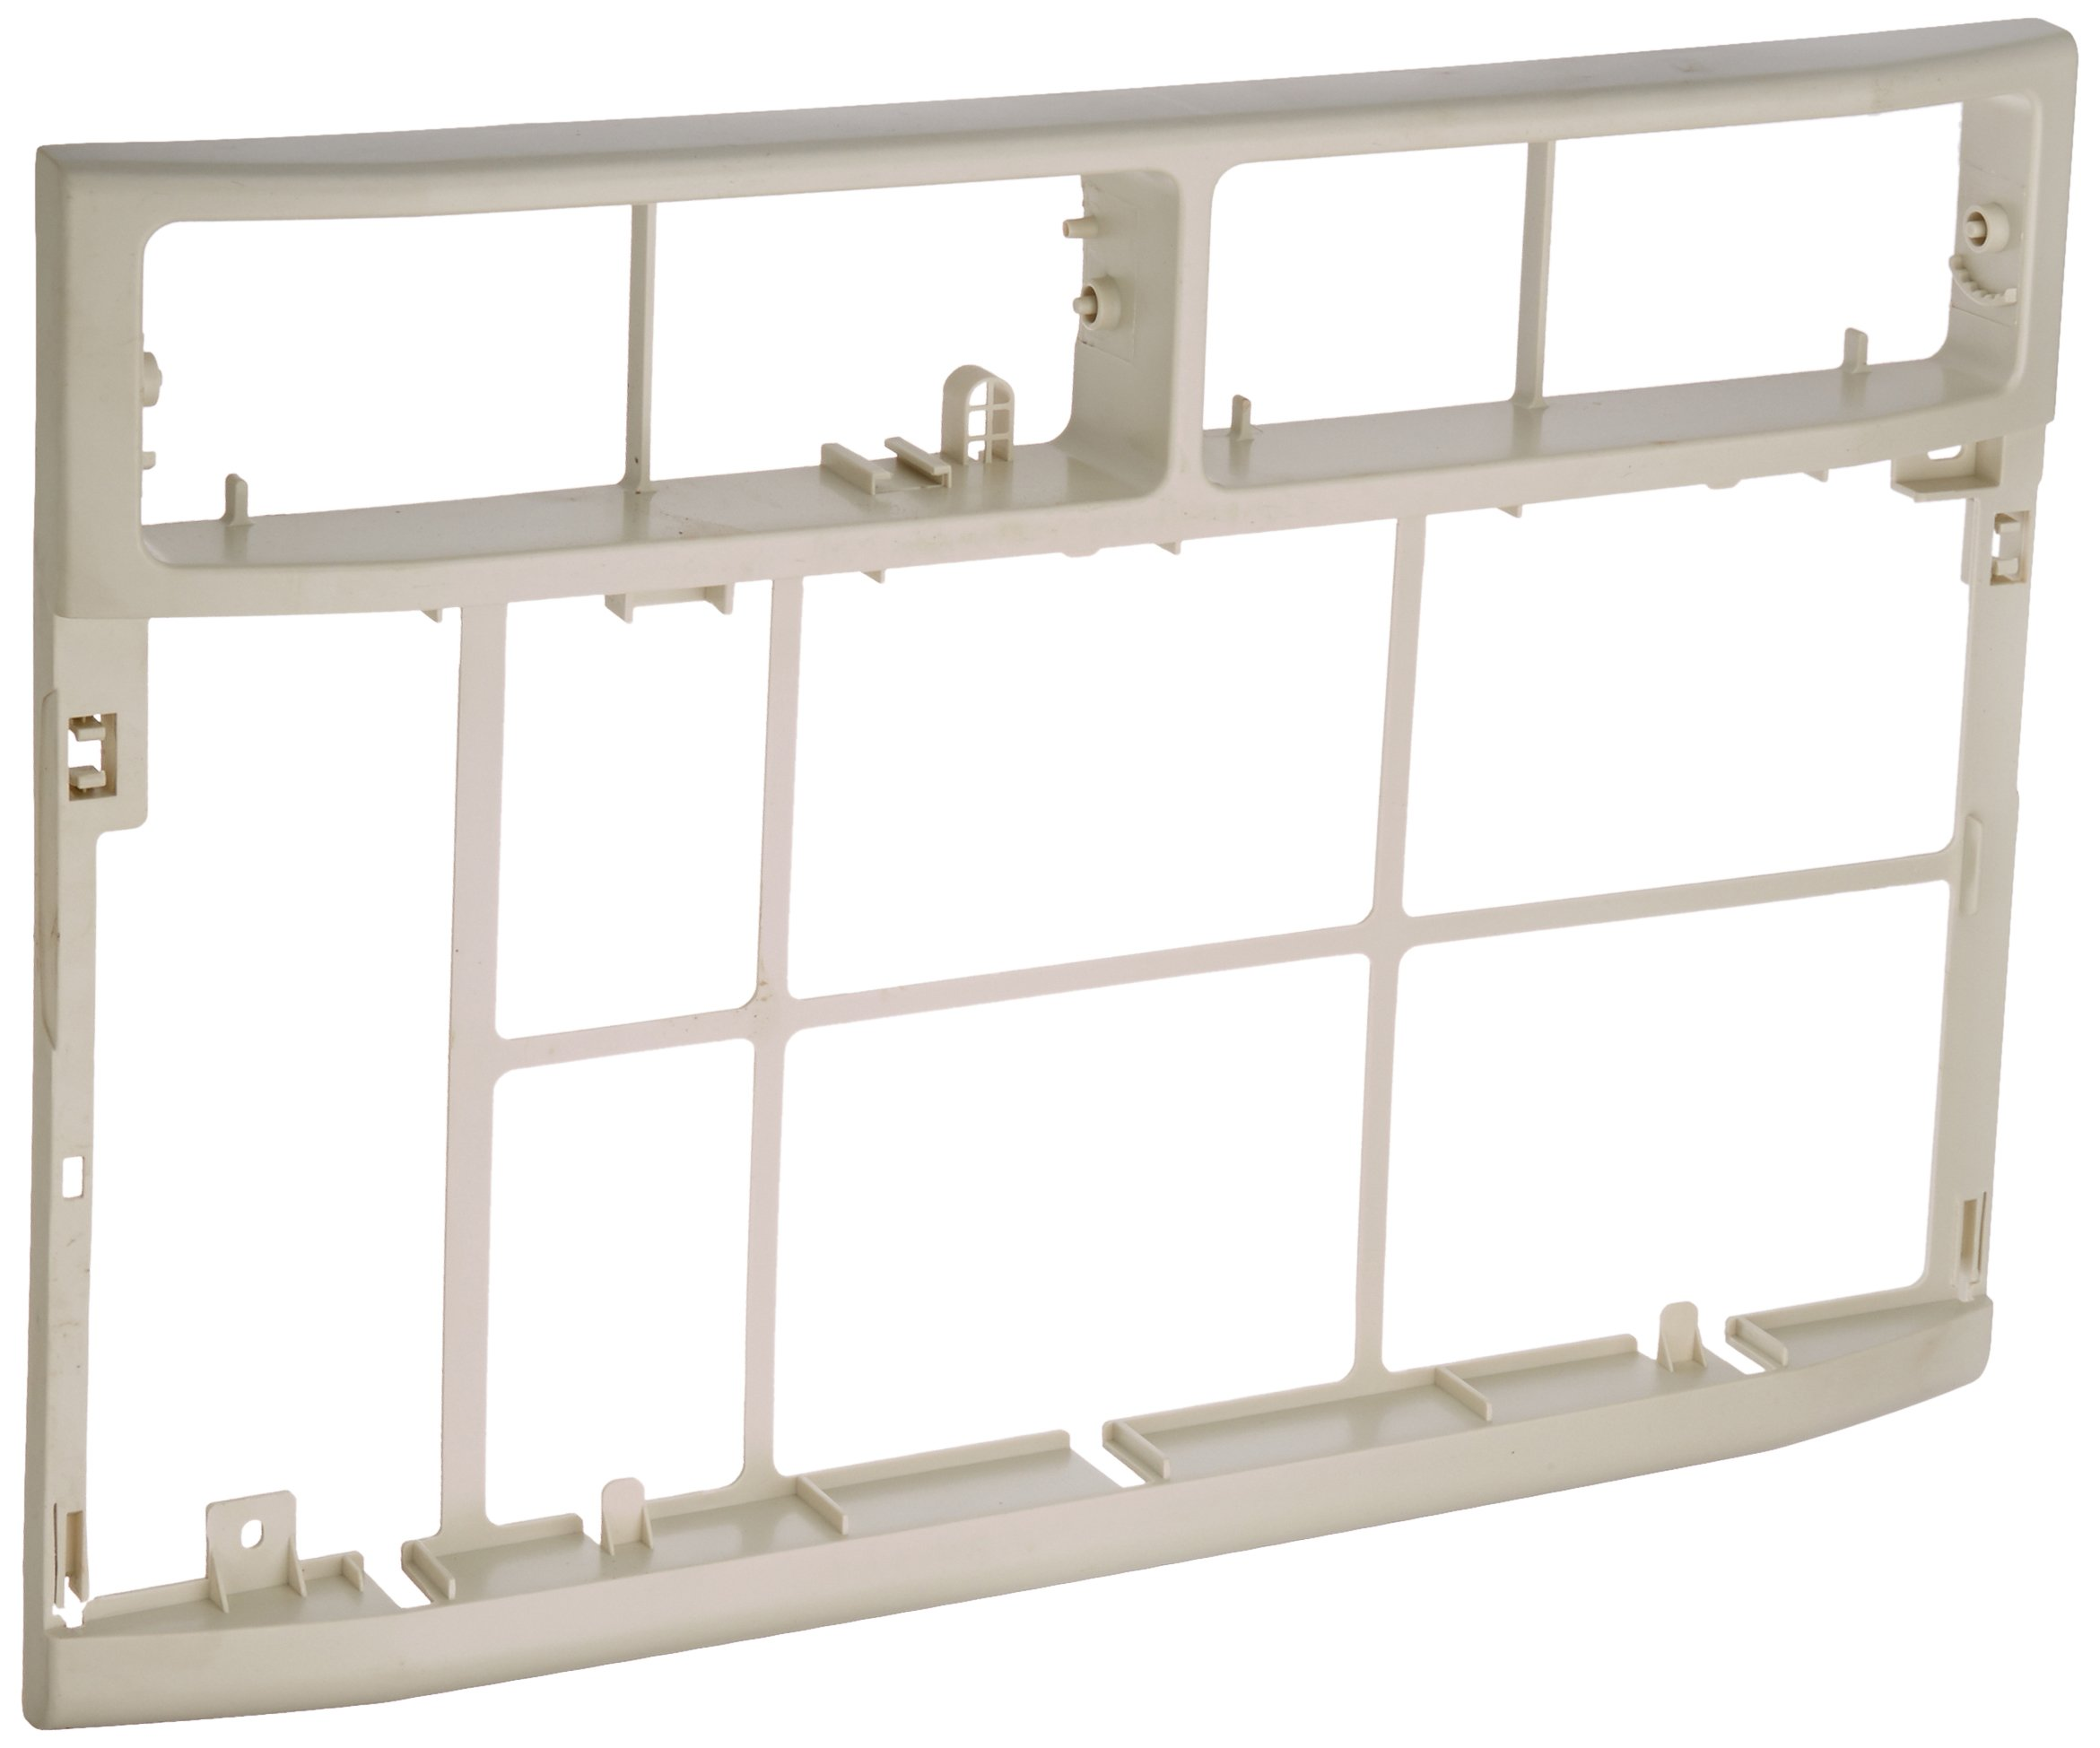 Frigidaire 5304436553 Air Conditioner Door Frame